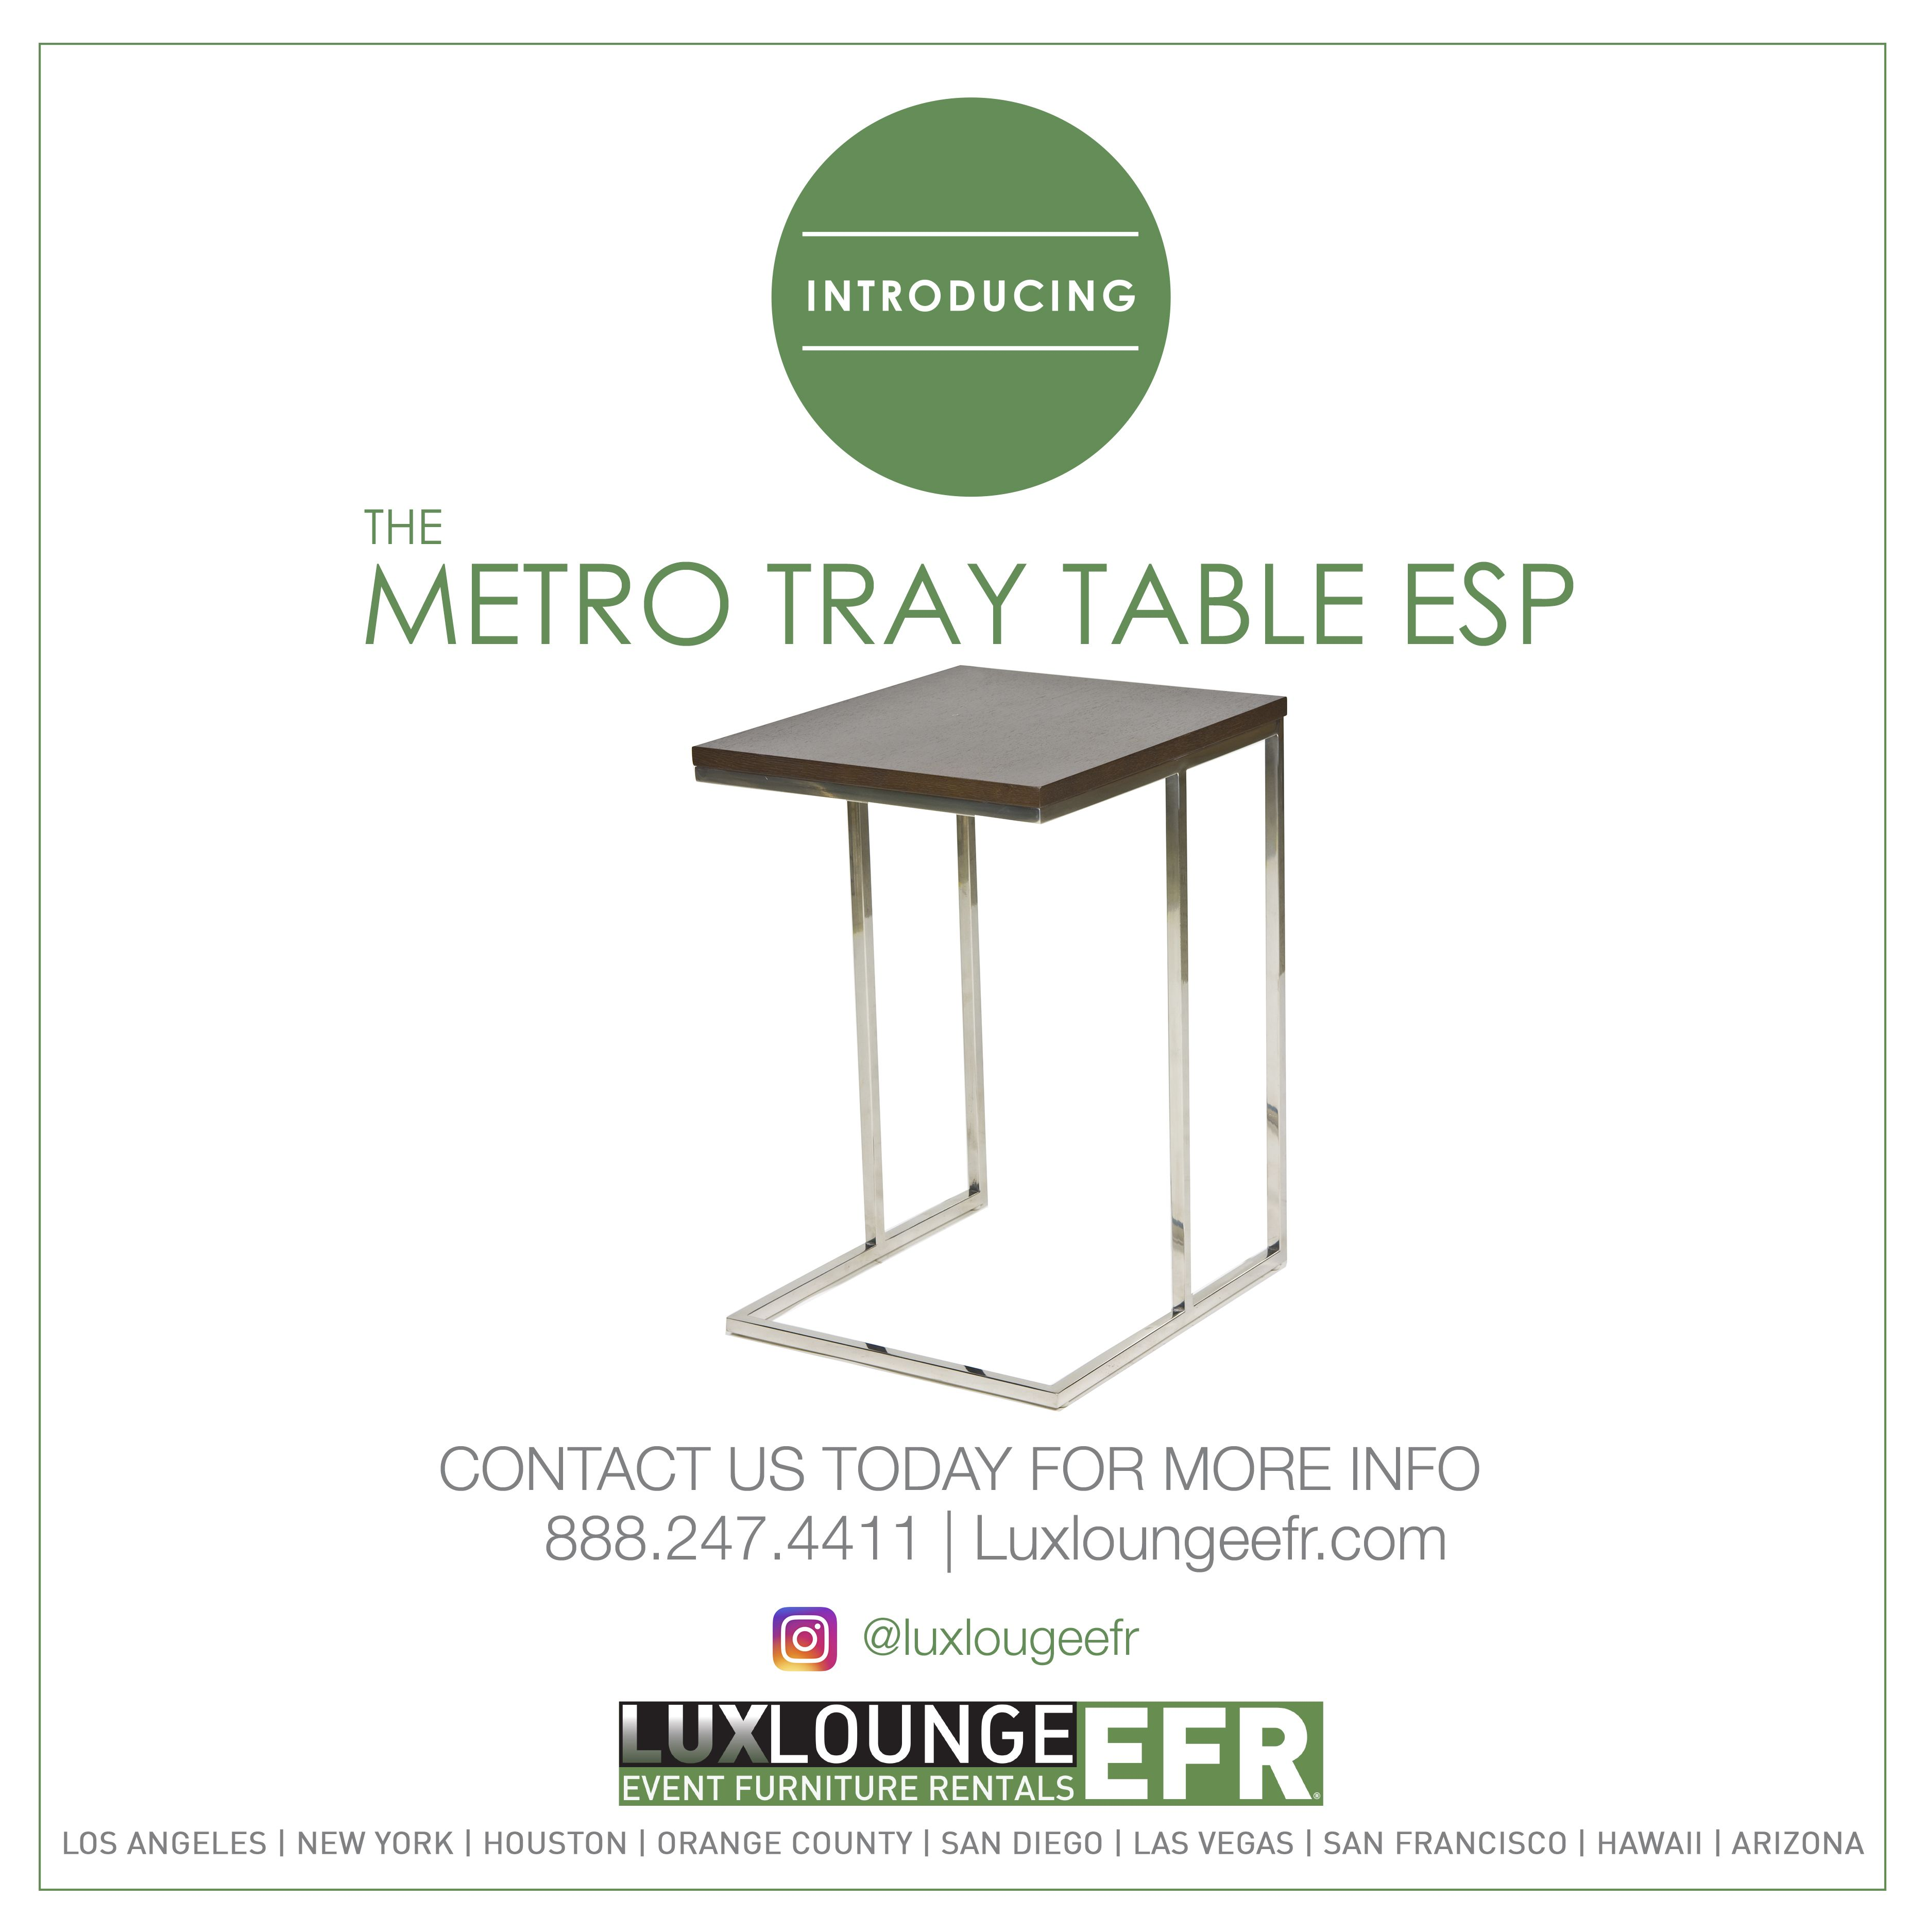 Metro Tray Table Esp Furniture Design Luxury Rental